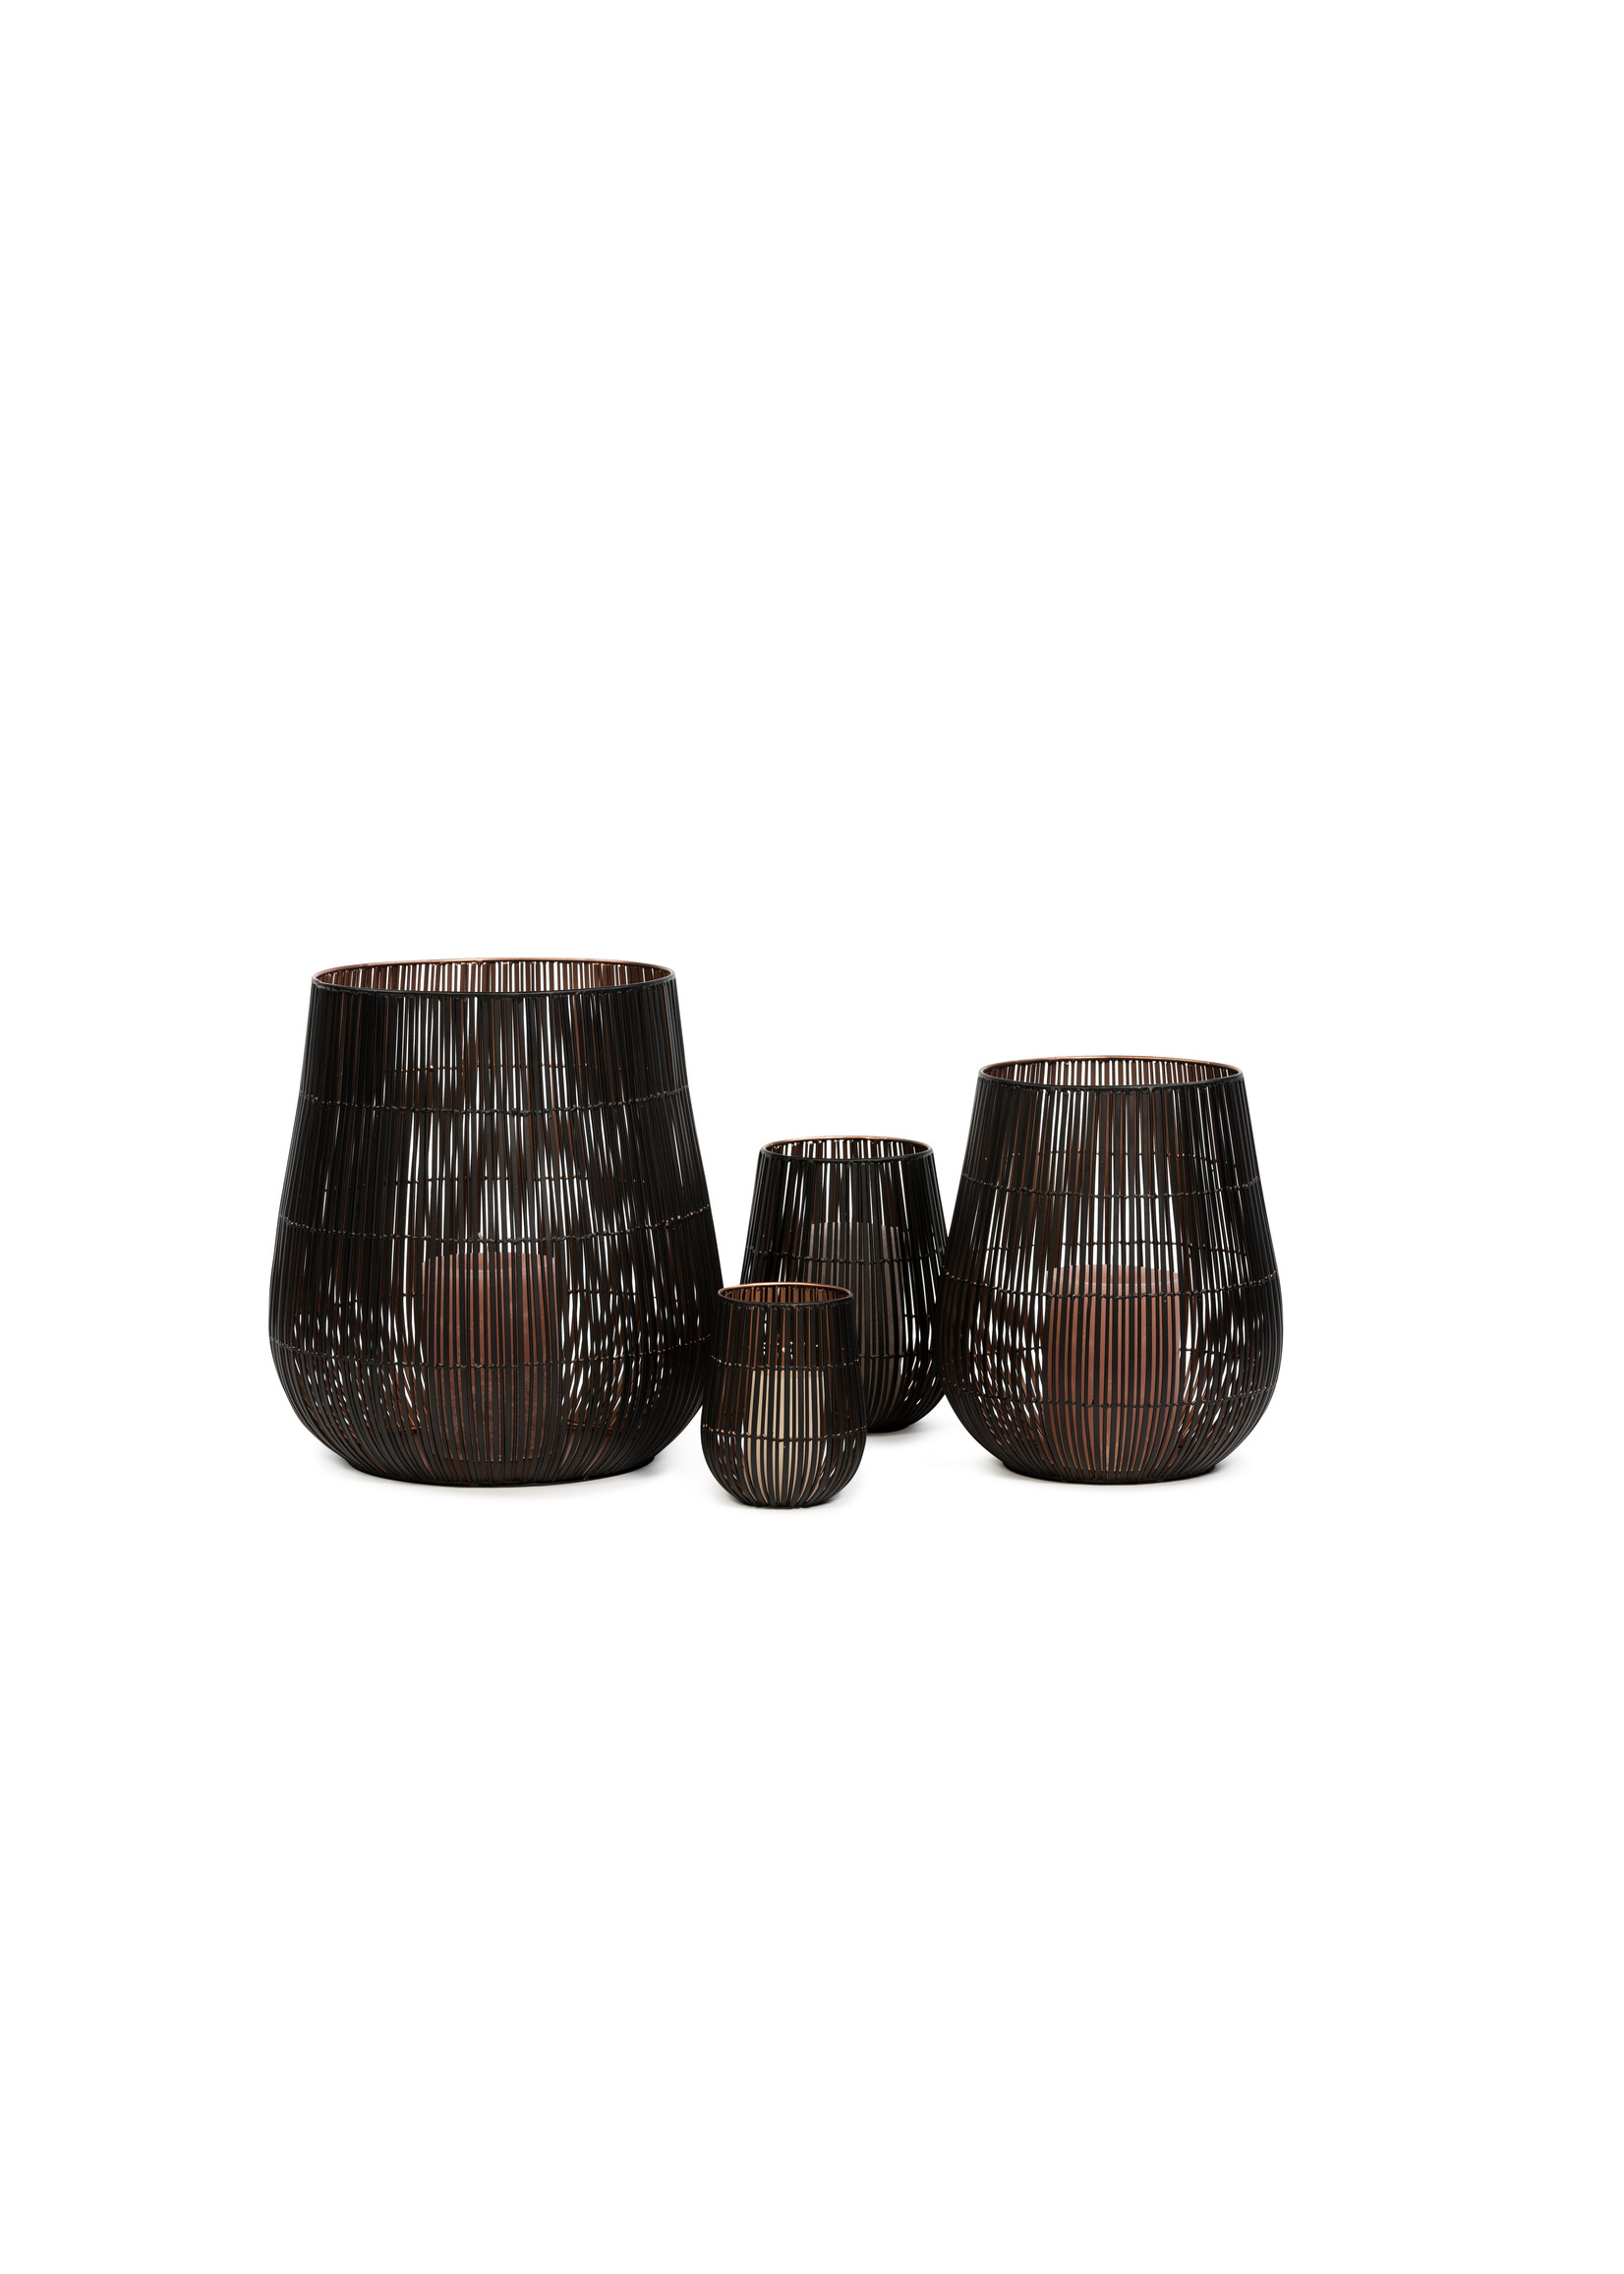 Dekocandle Windlicht Metal Black & Copper Large